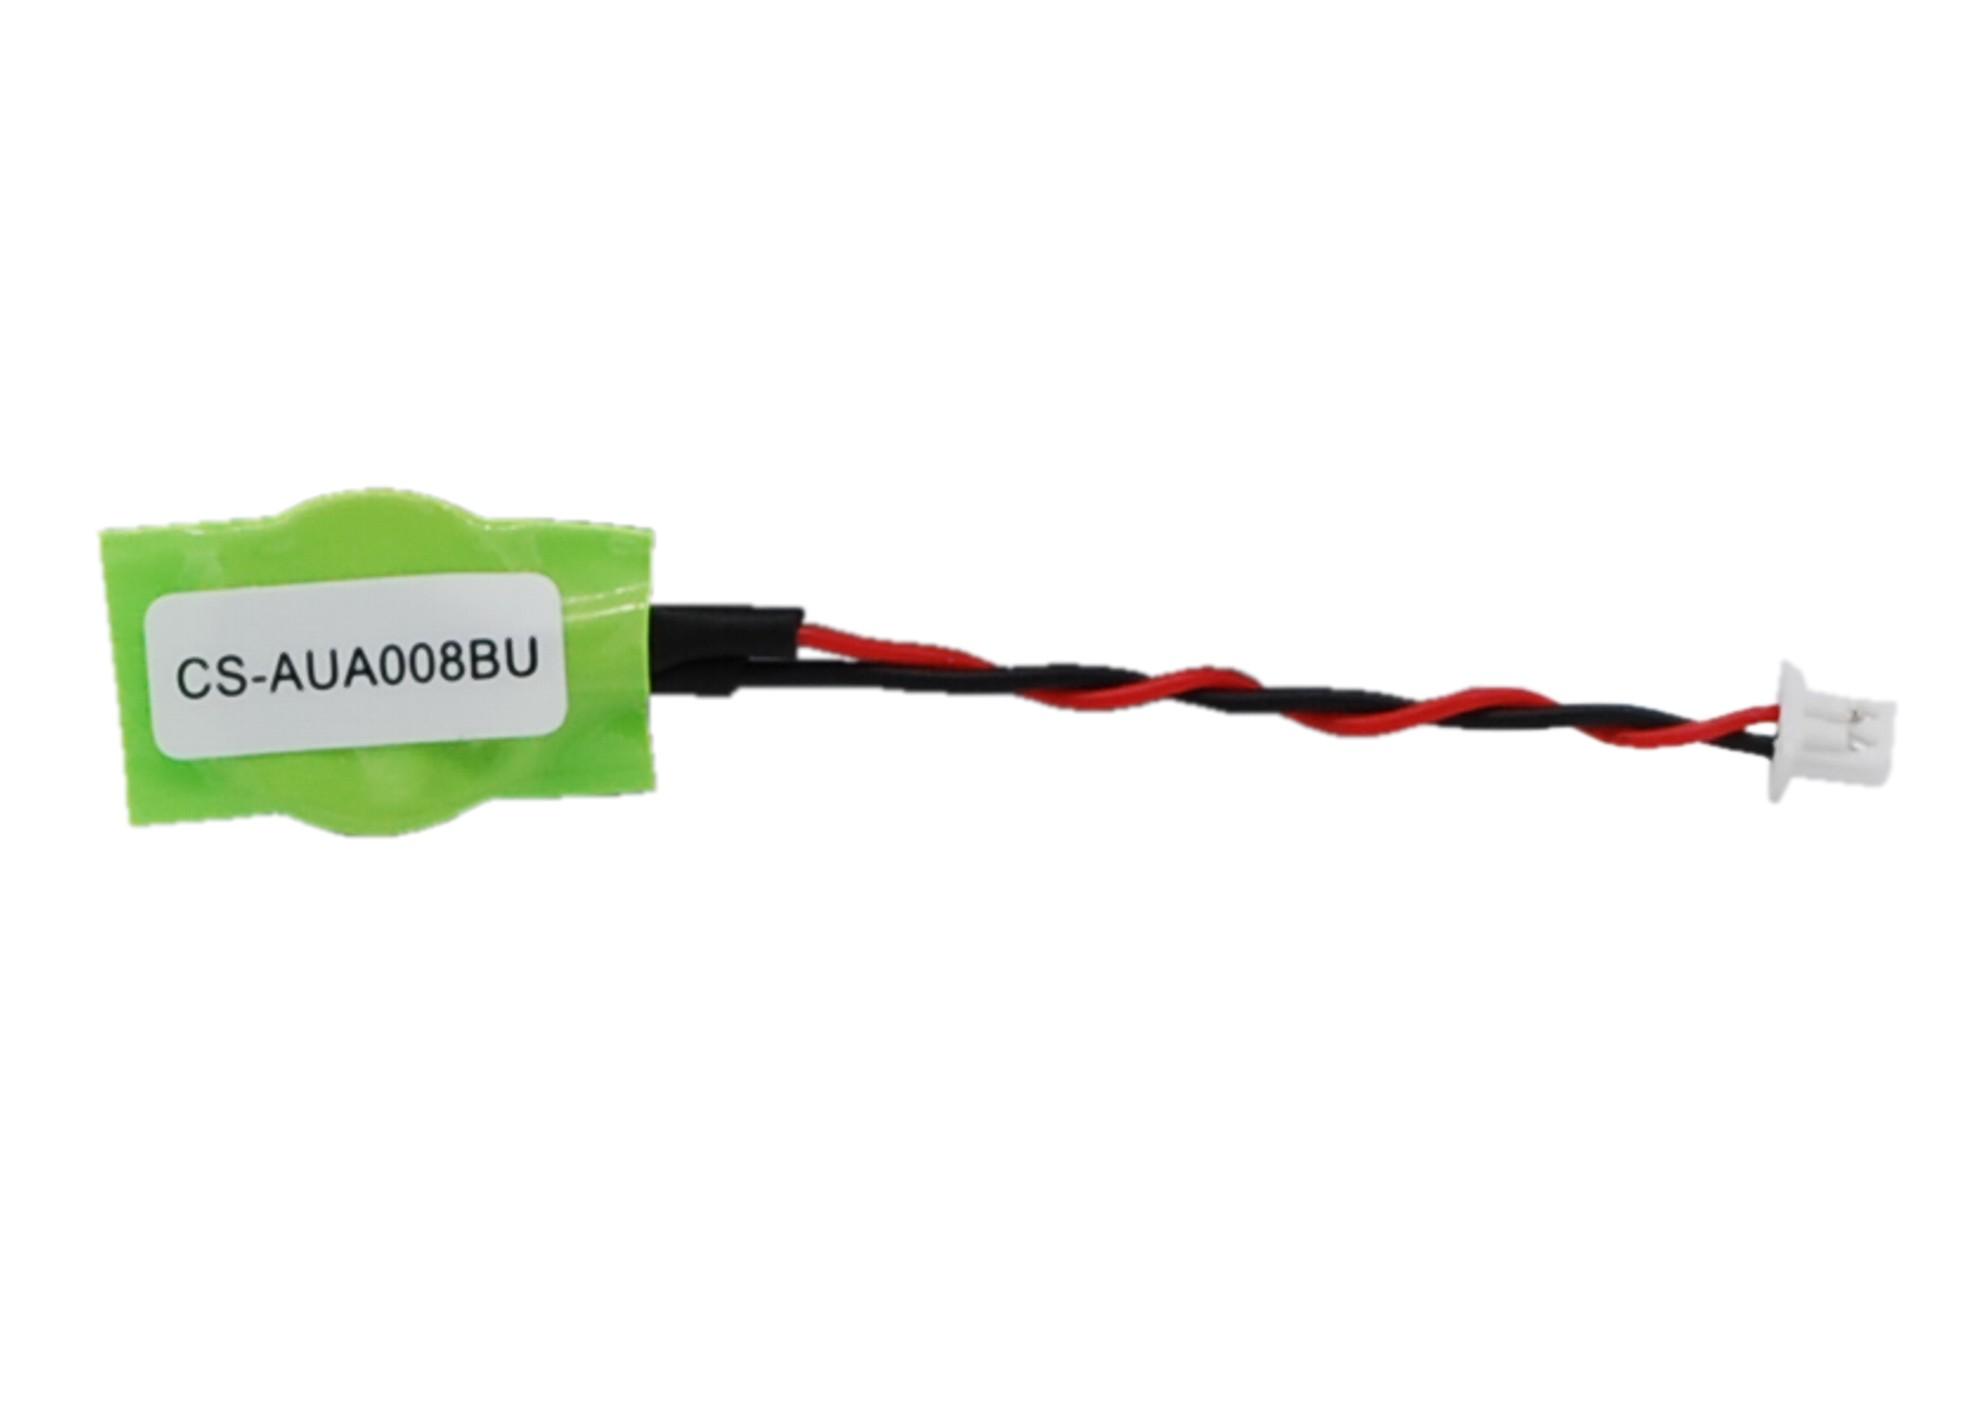 Cameron Sino baterie cmos pro ASUS Eee PC 1005HAG 3V Li-ion 40mAh zelená - neoriginální